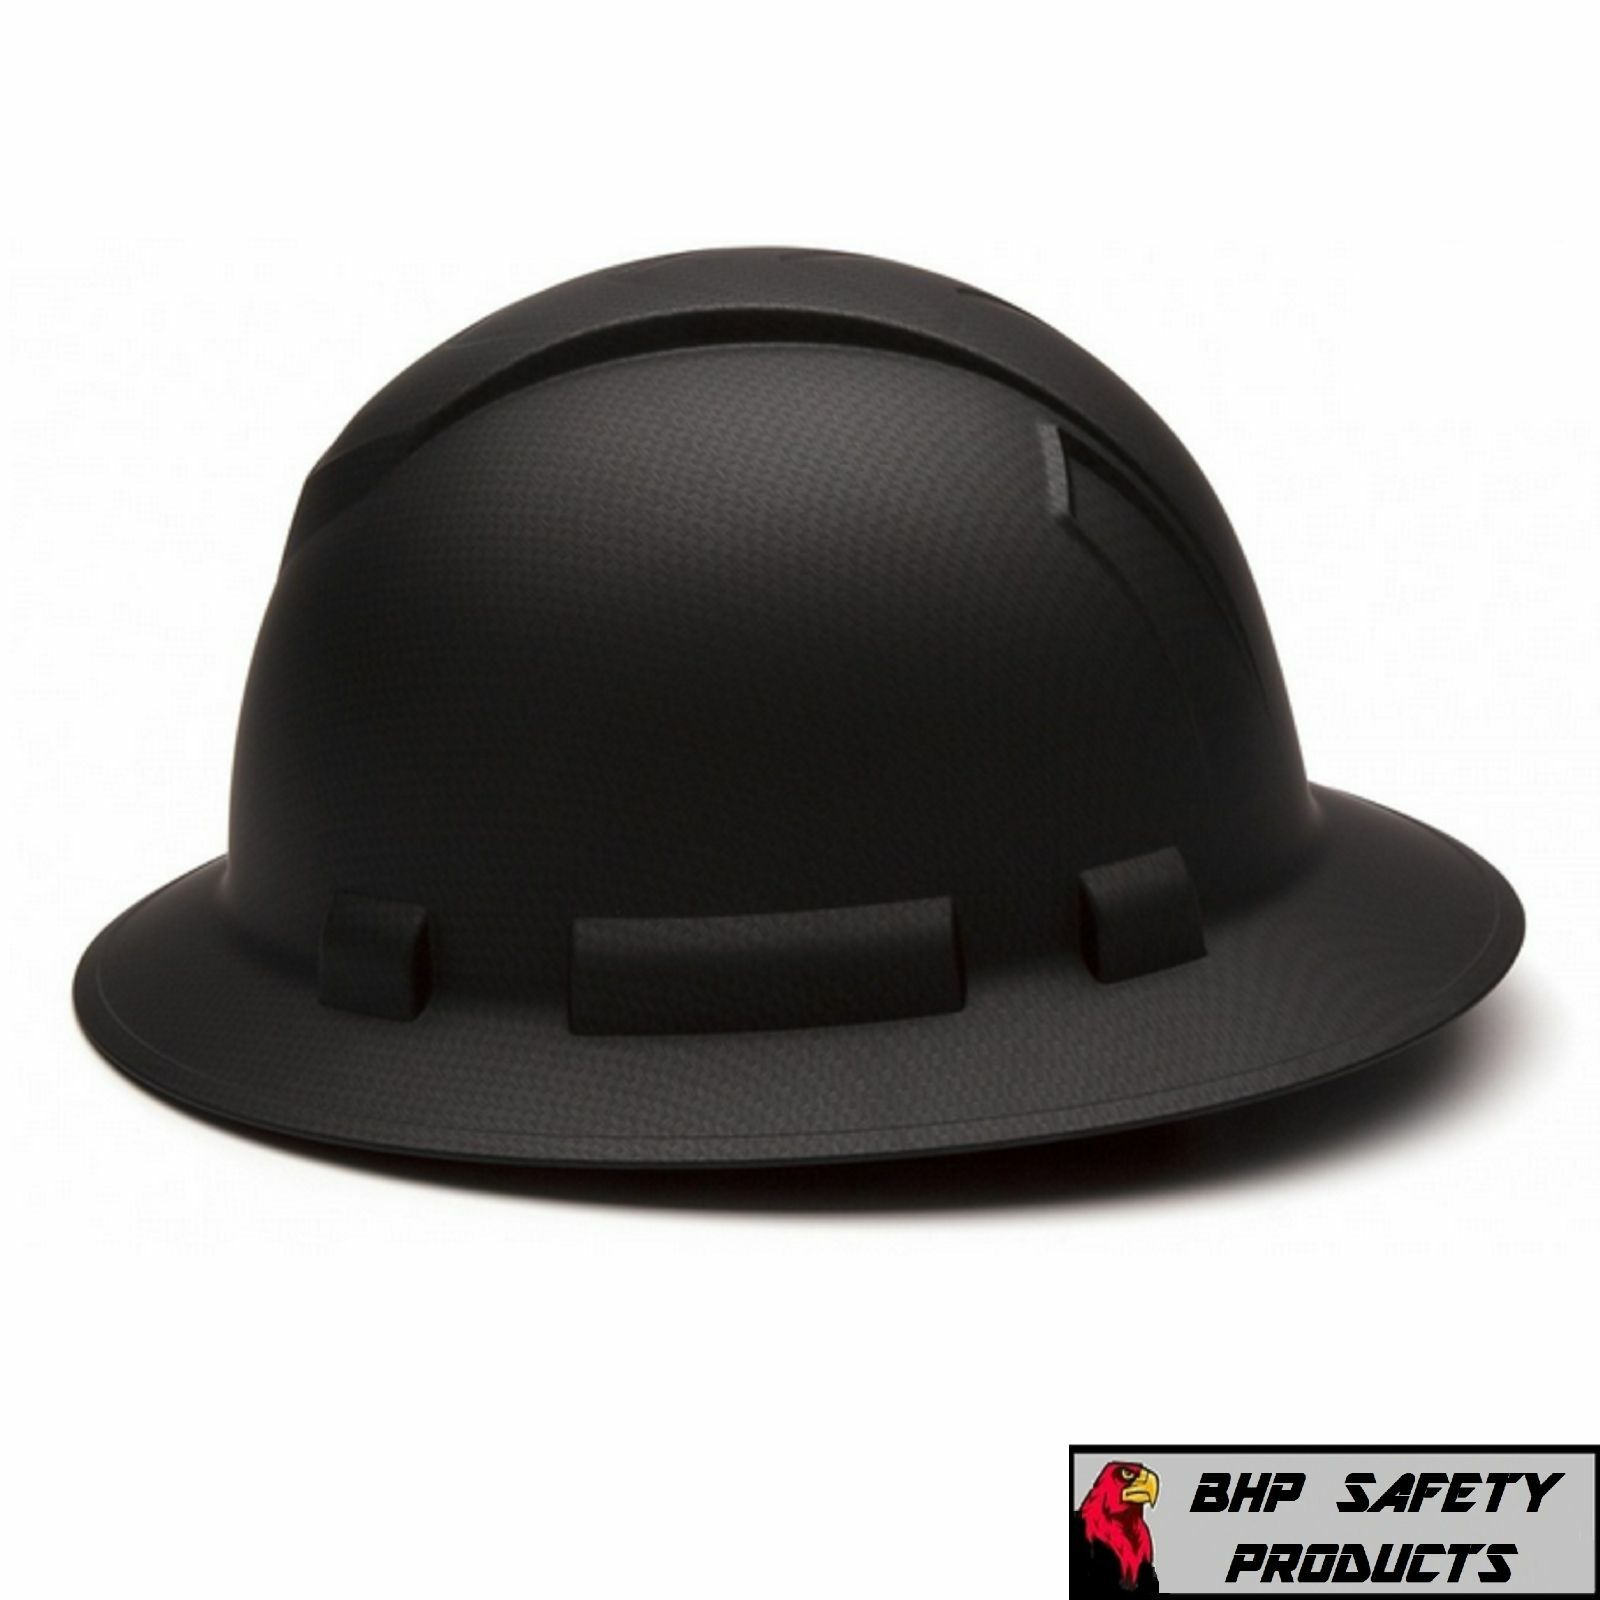 PYRAMEX RIDGELINE HARD HAT GRAPHITE PATTERN BLACK GRAY FULL BRIM SAFETY HP54117